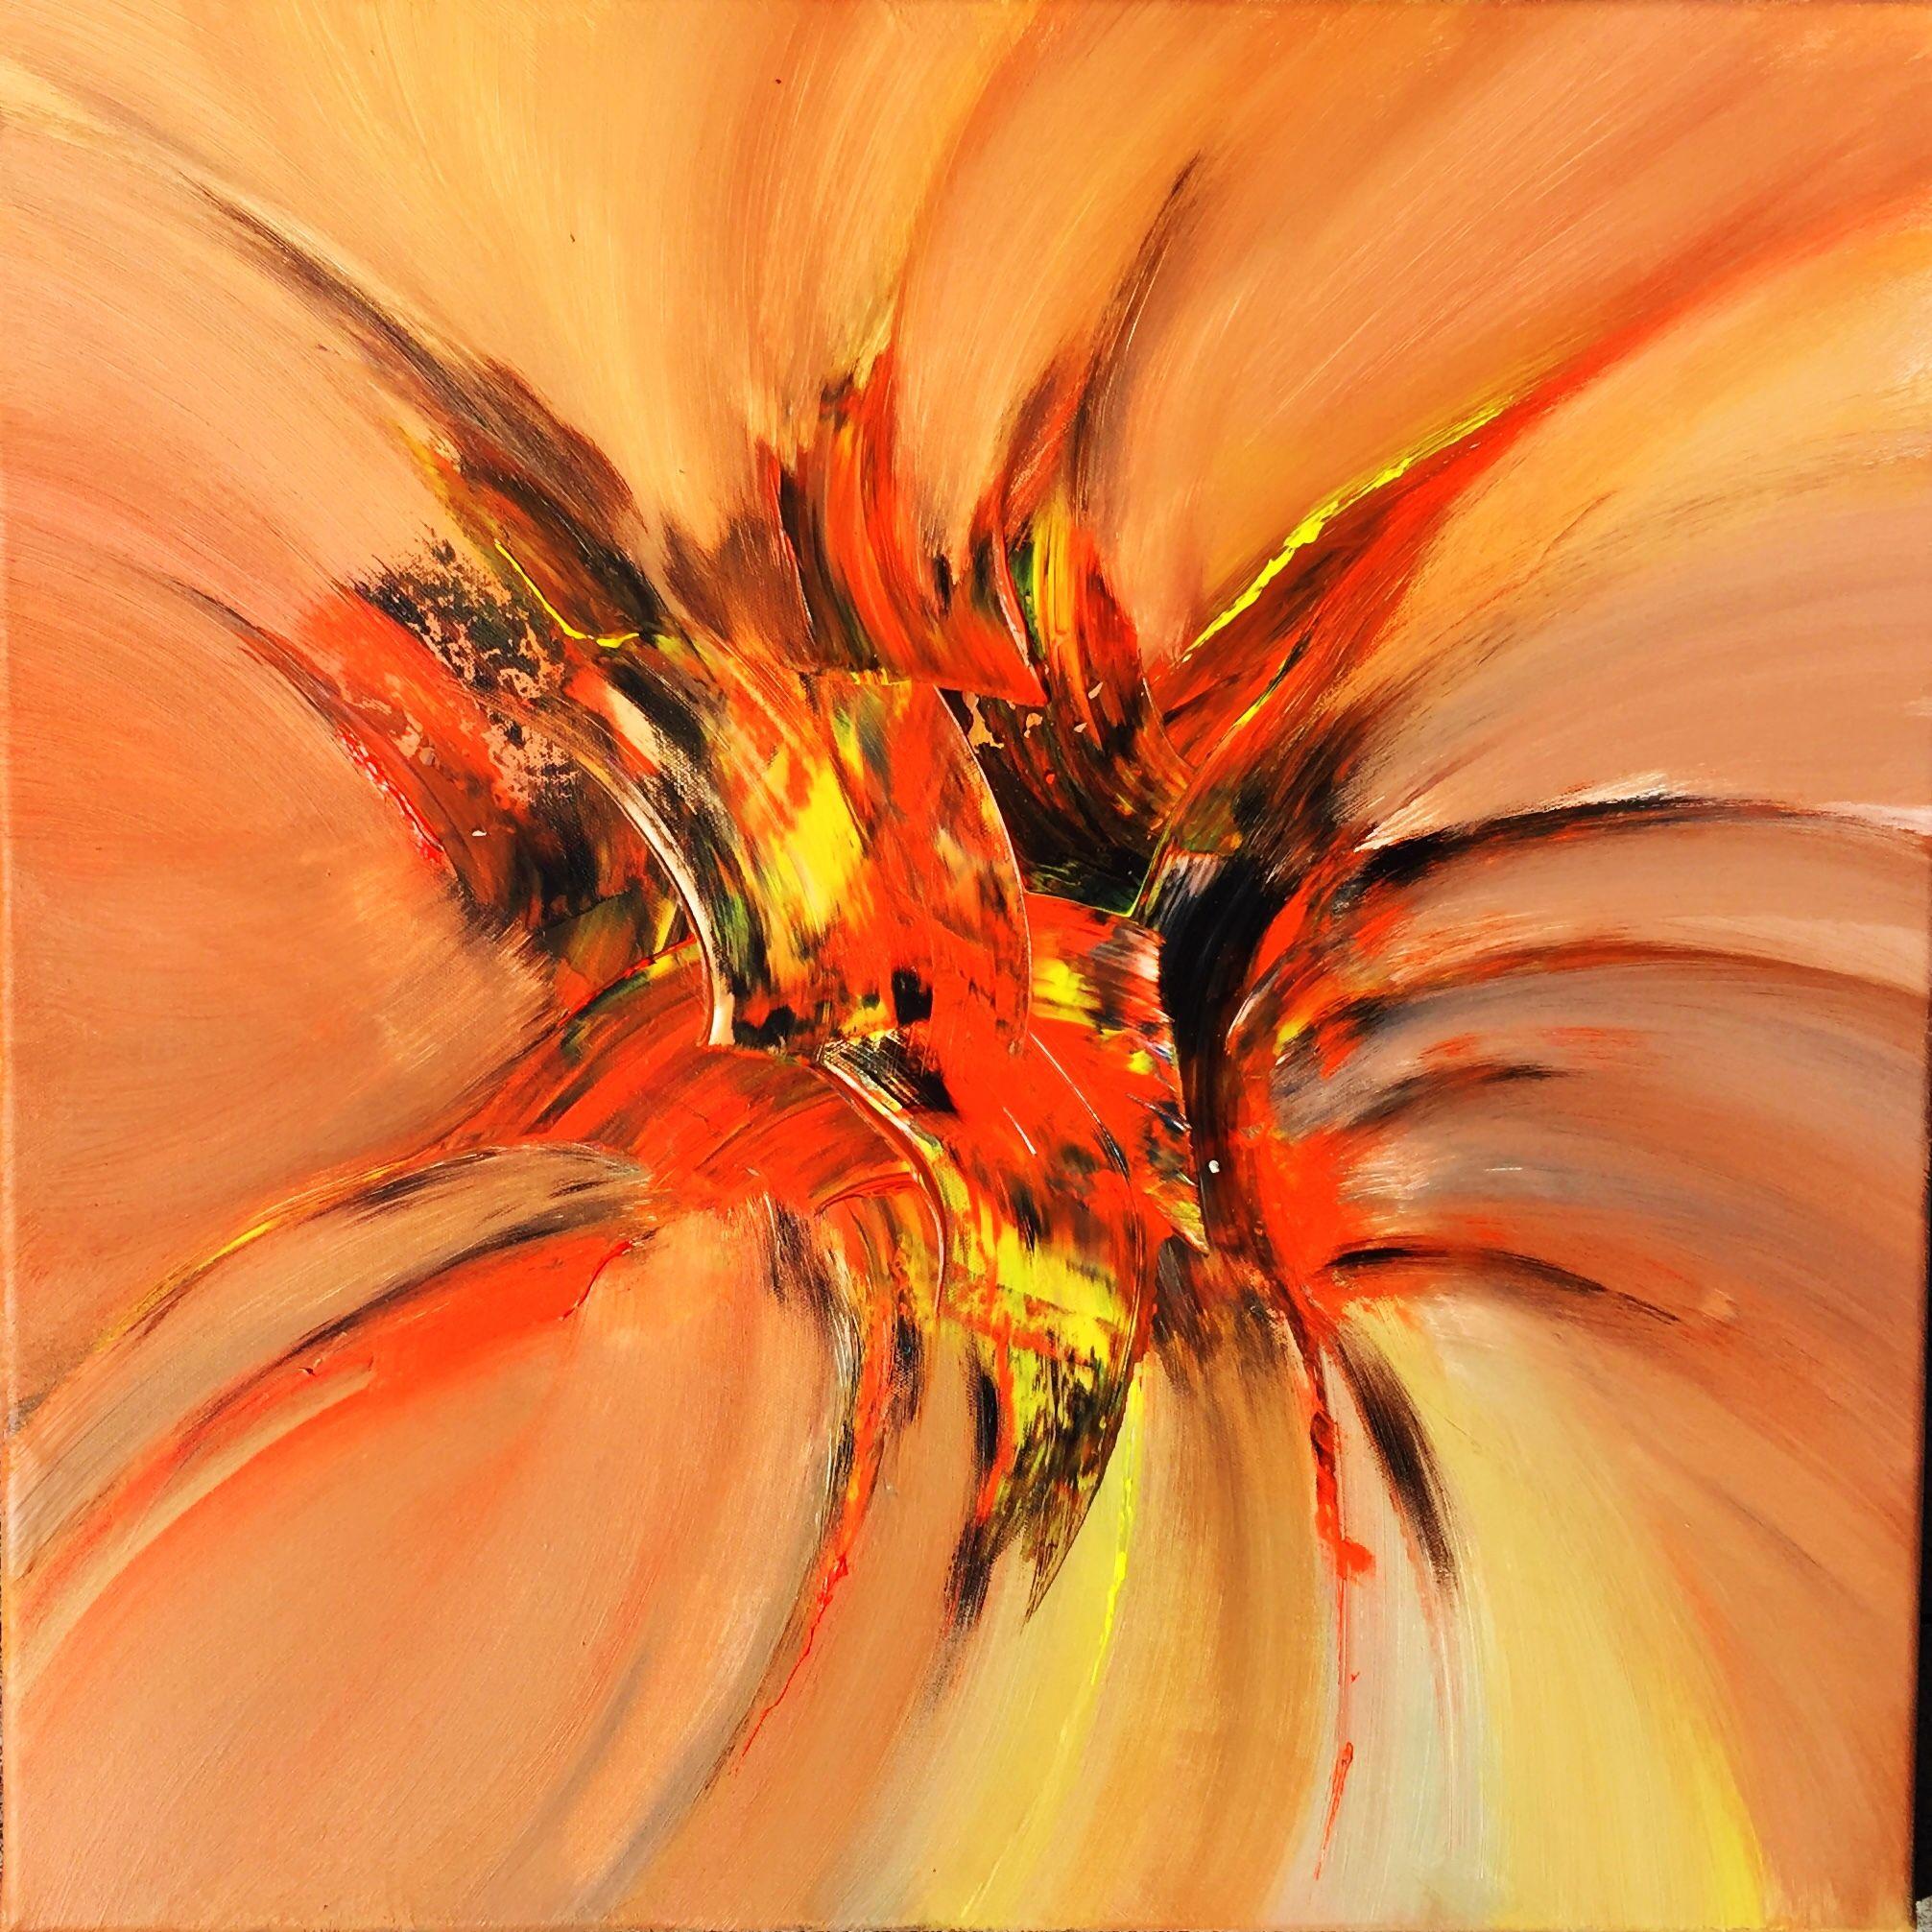 Malkurse Abstraktes Feeling Mit Acryl By Www Real Art Ch Malkurs